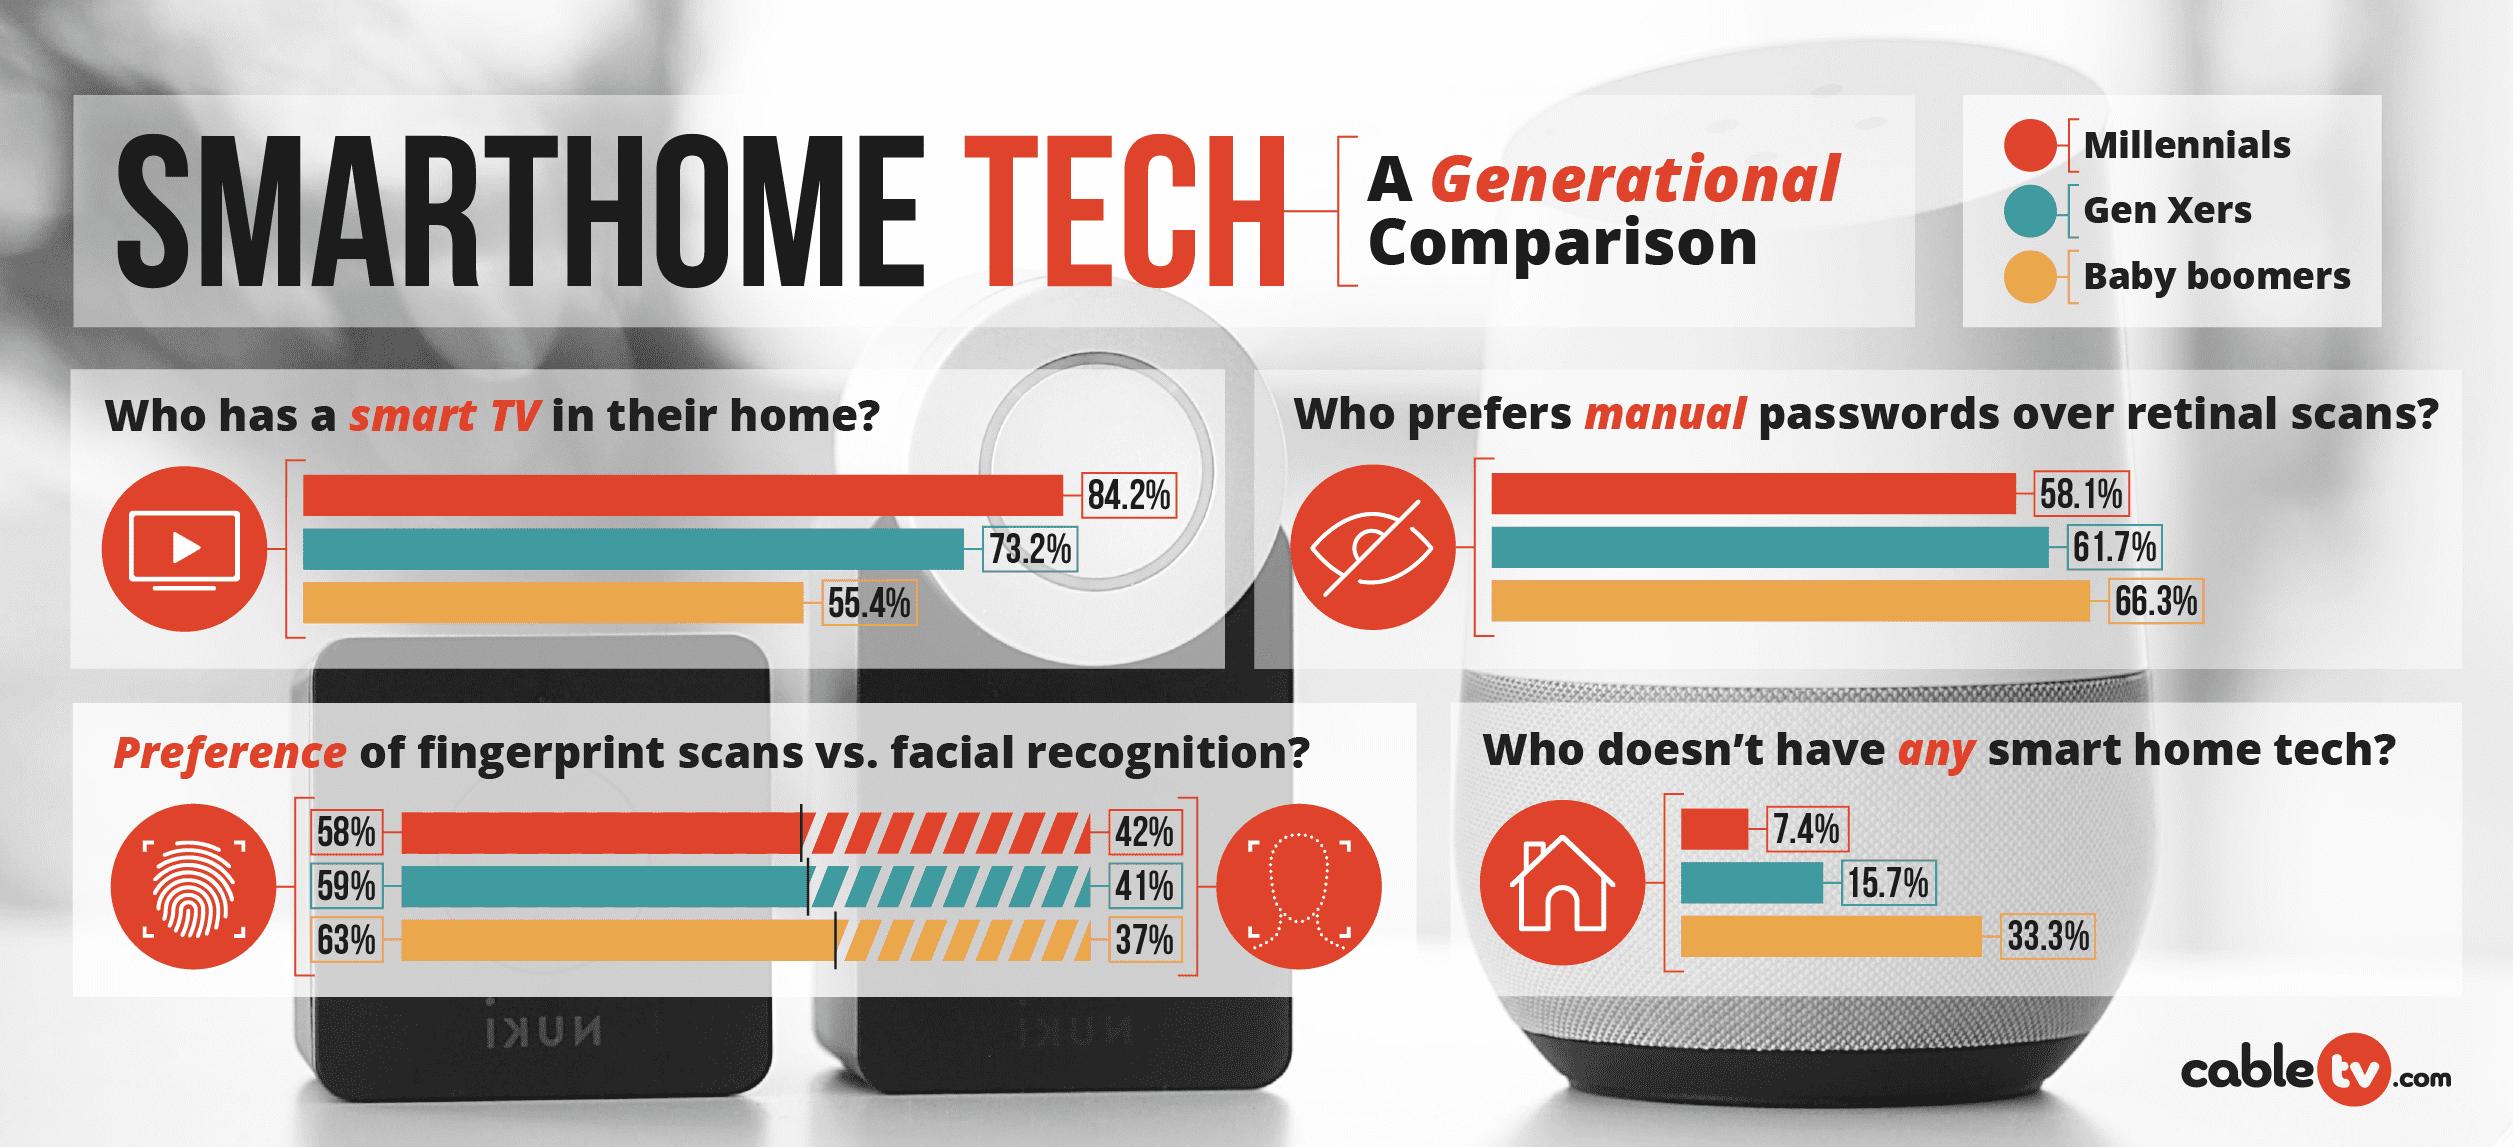 Smarthome Tech in America | Cabletv.com